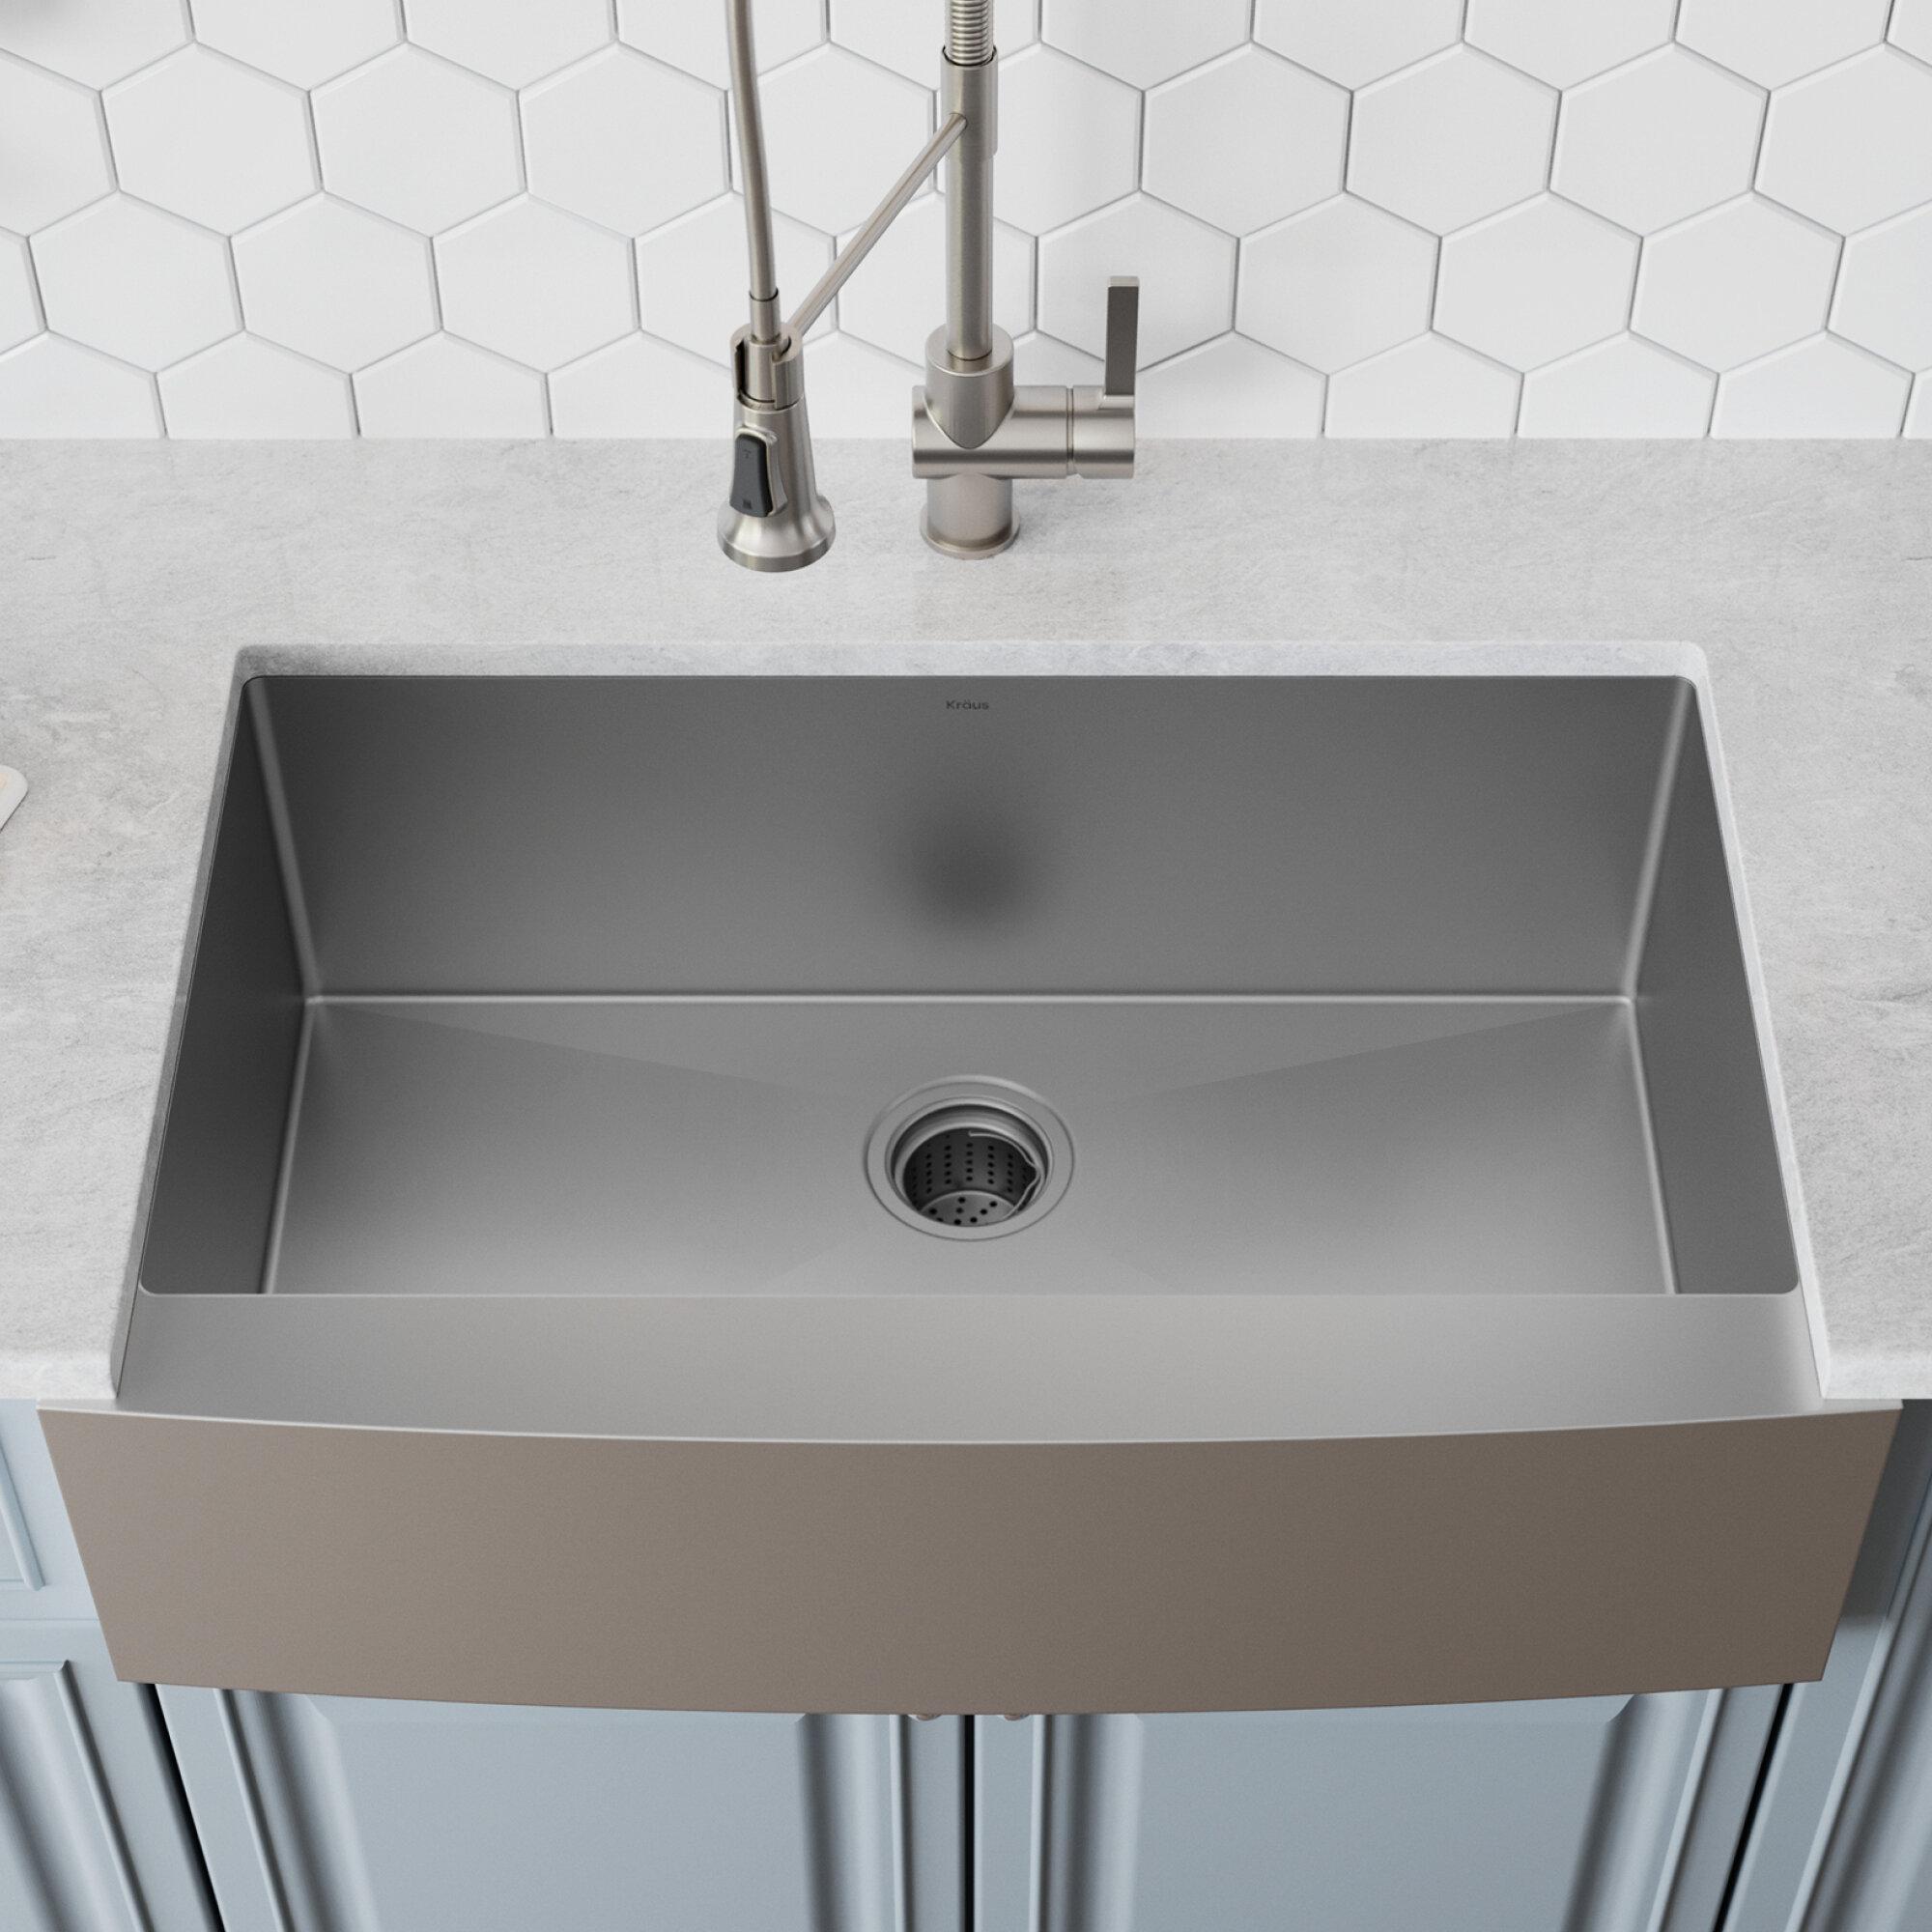 Khf200 36 Kraus 36 L X 21 W Farmhouse Kitchen Sink With Drain